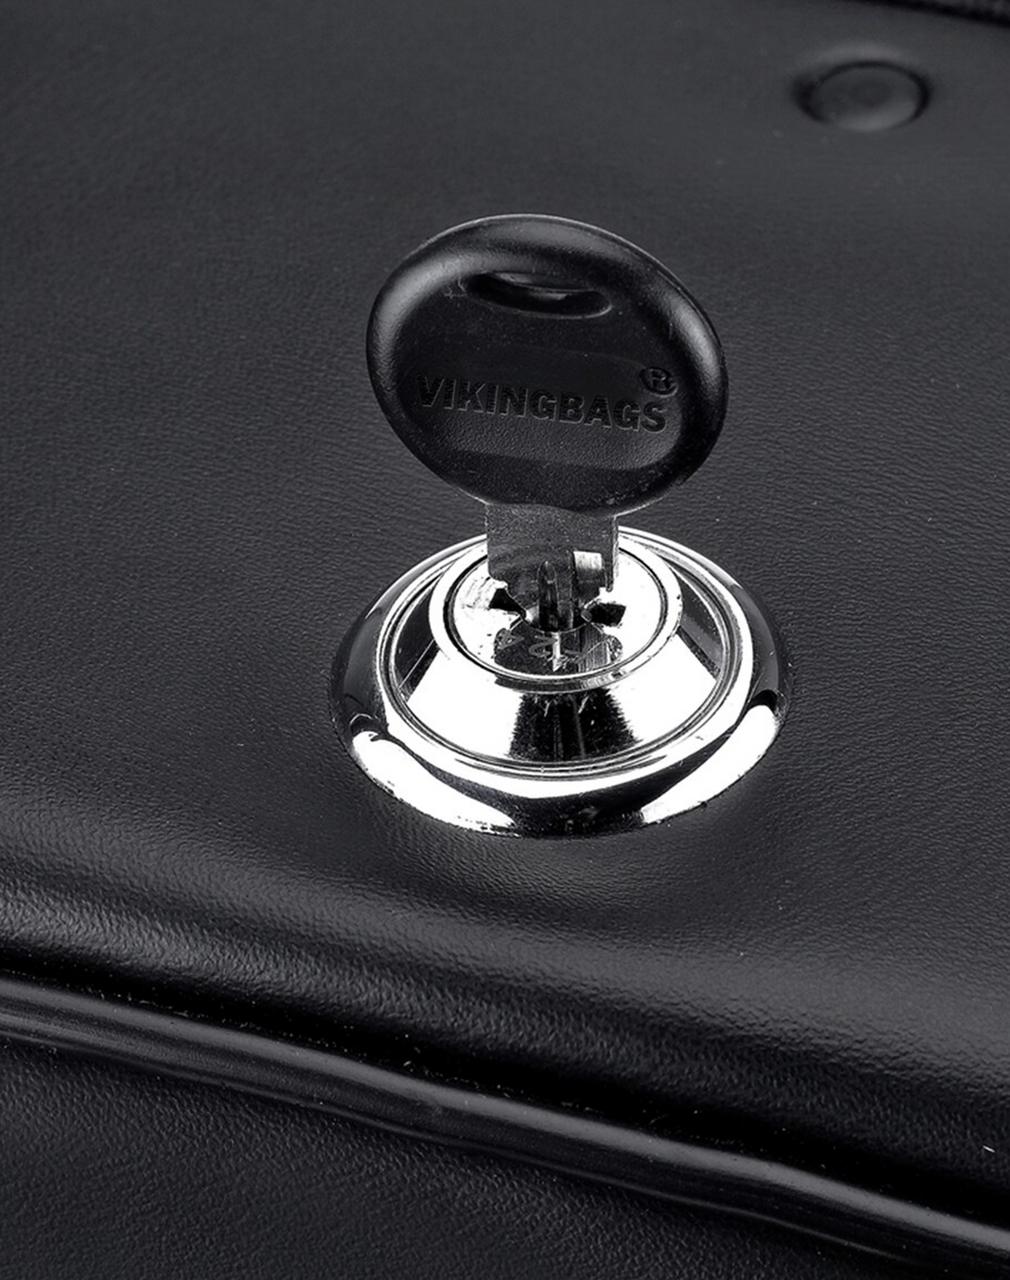 Honda Magna 750 Large Single Strap Shock Cutout Slanted Motorcycle Saddlebags lock key view